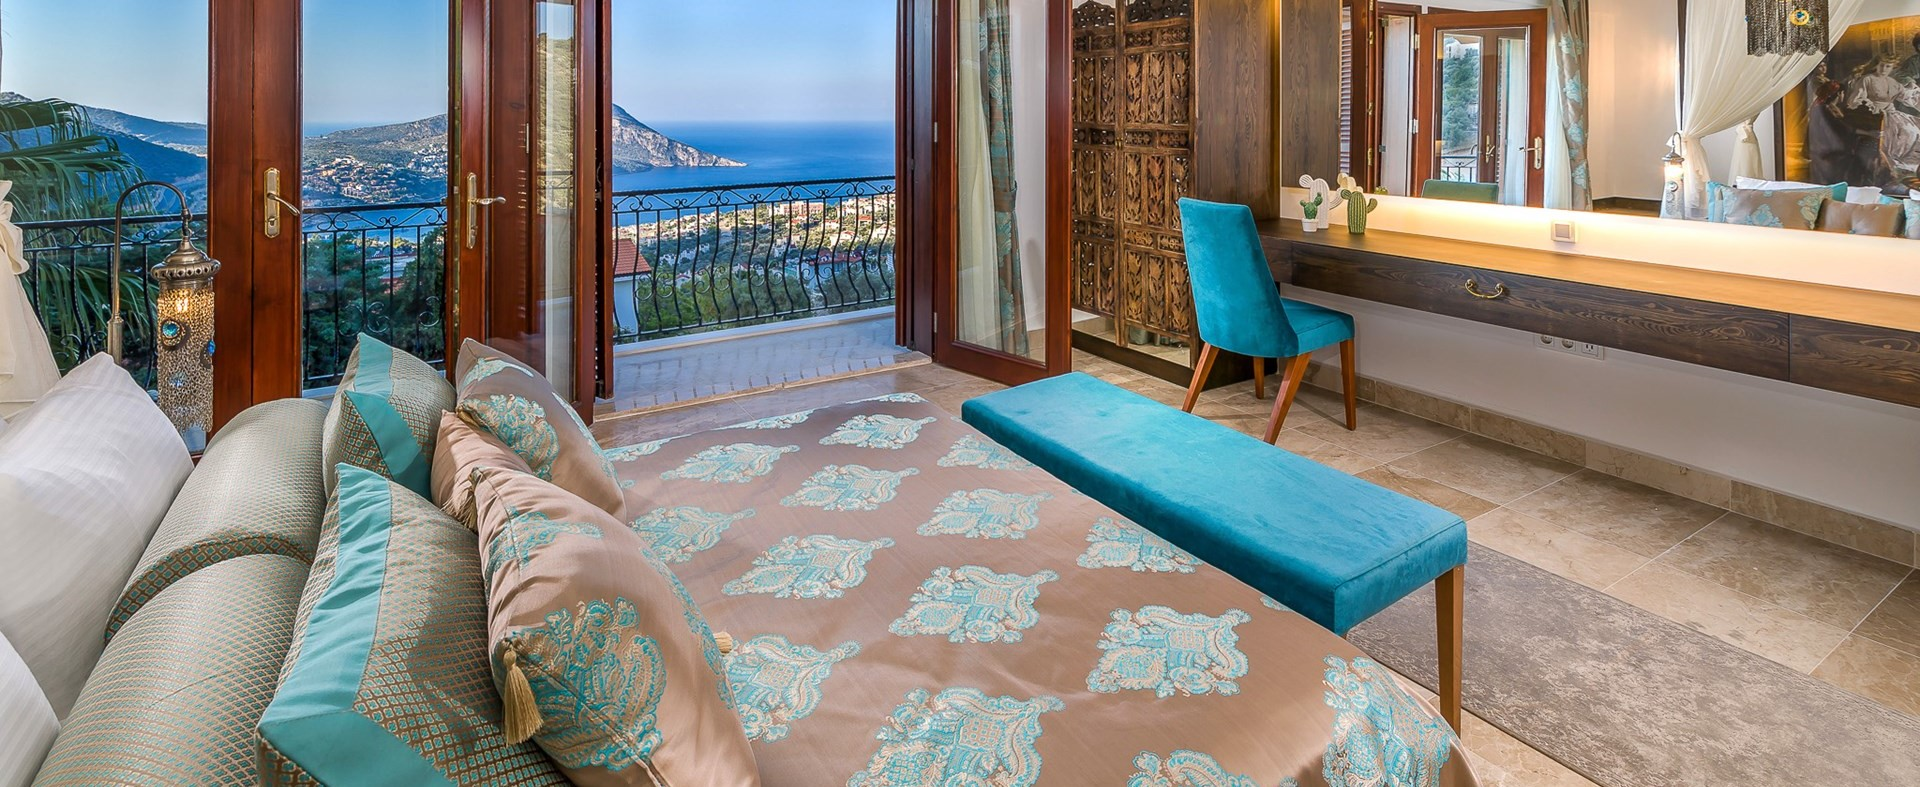 villa-caria-kalkan-master-bedroom